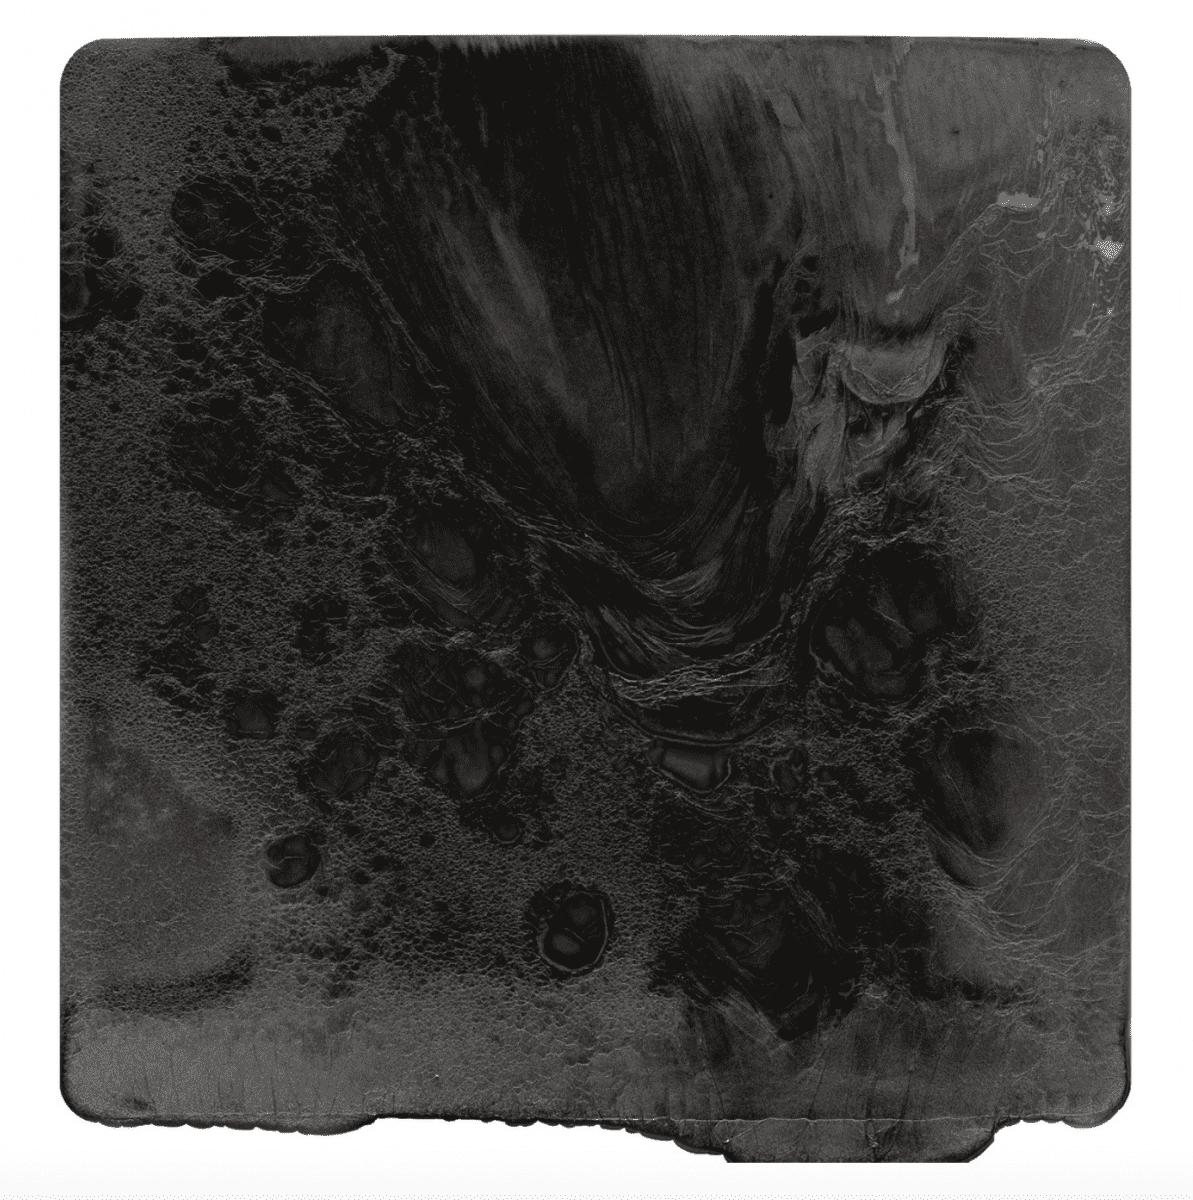 "Brittany Nelson, Gelatin Silver 3, Chromogenic Print, 40"" x 40"", 2015."